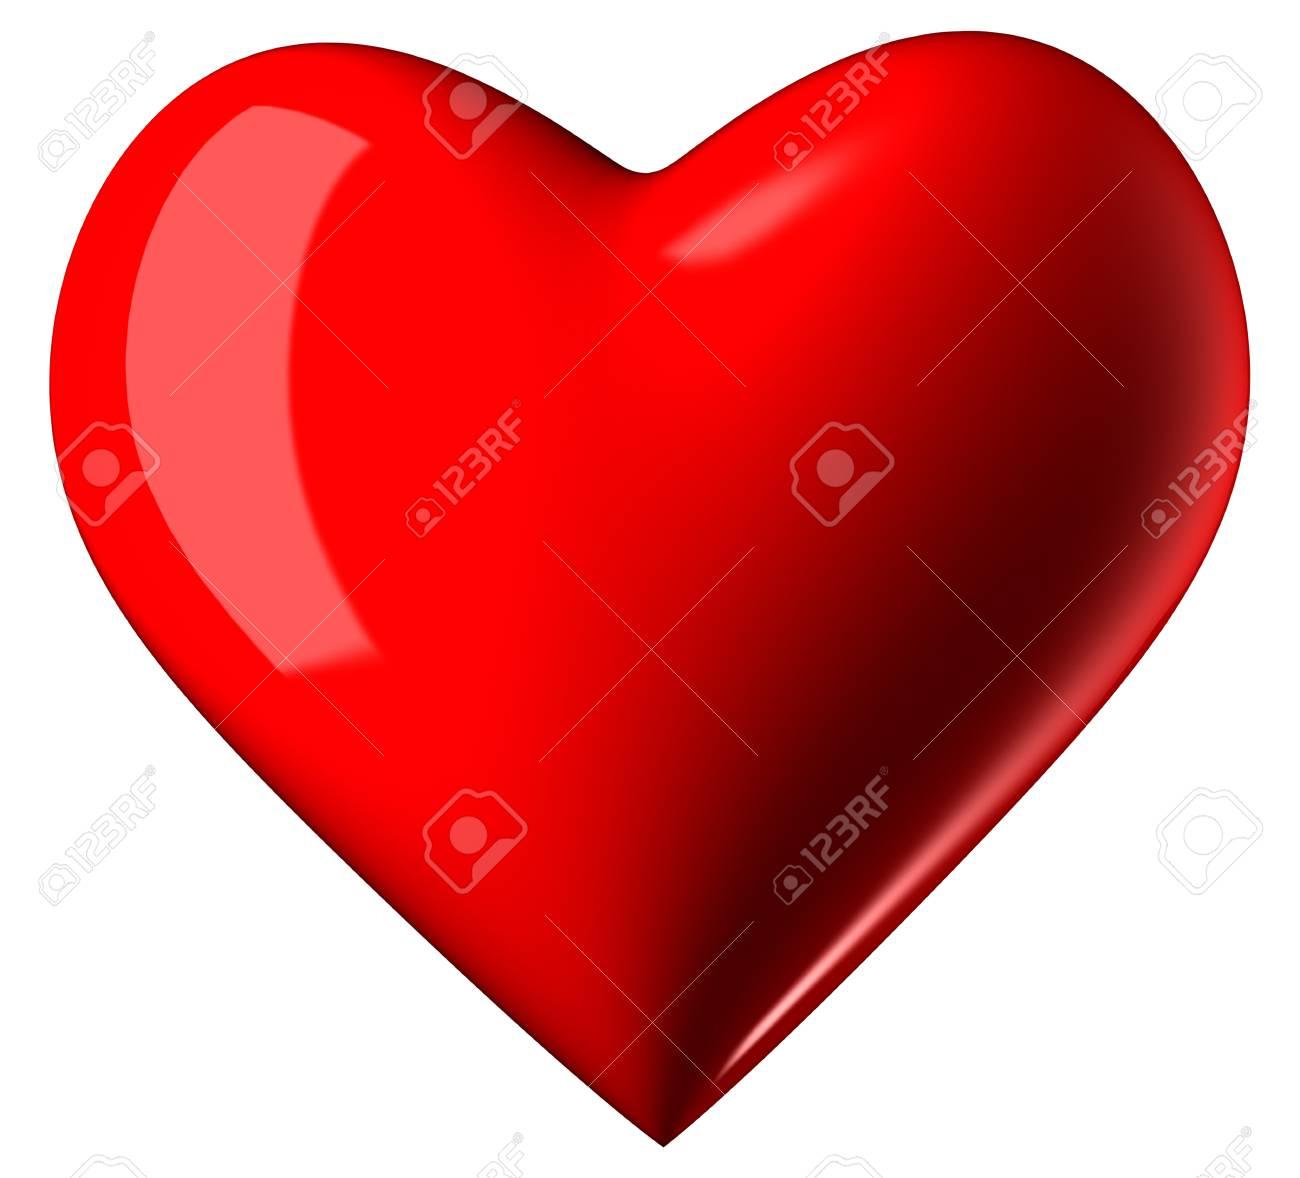 Valentine Heart - Symbol of Love Stock Photo - 20869694